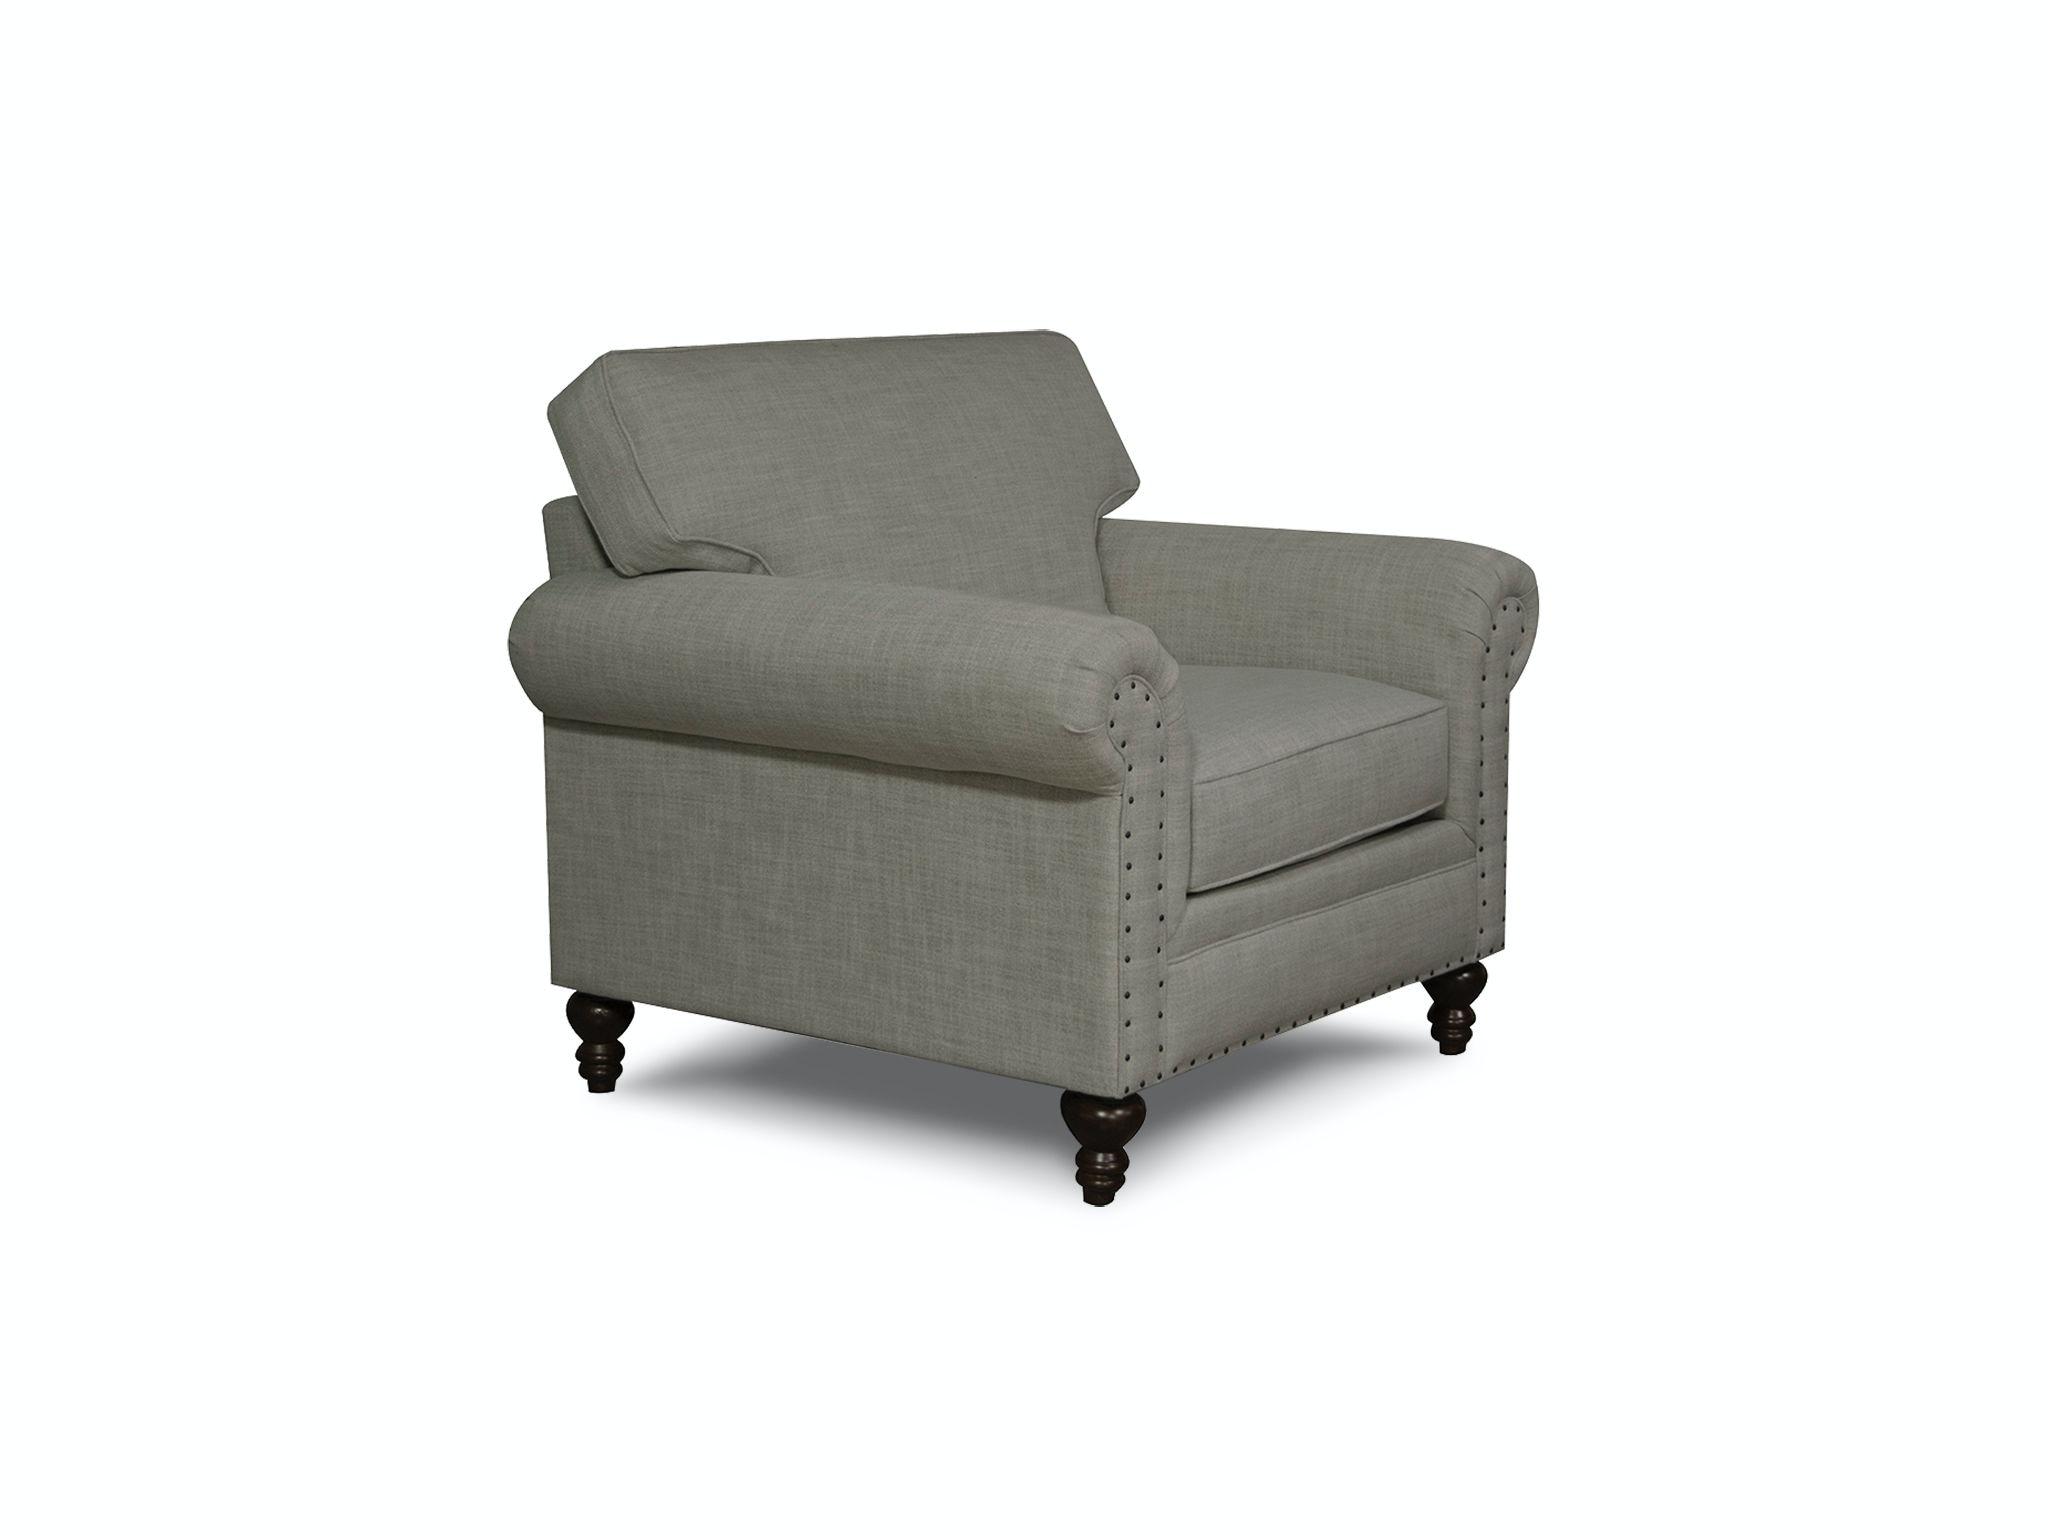 england living room renea chair with nails 5r04n england